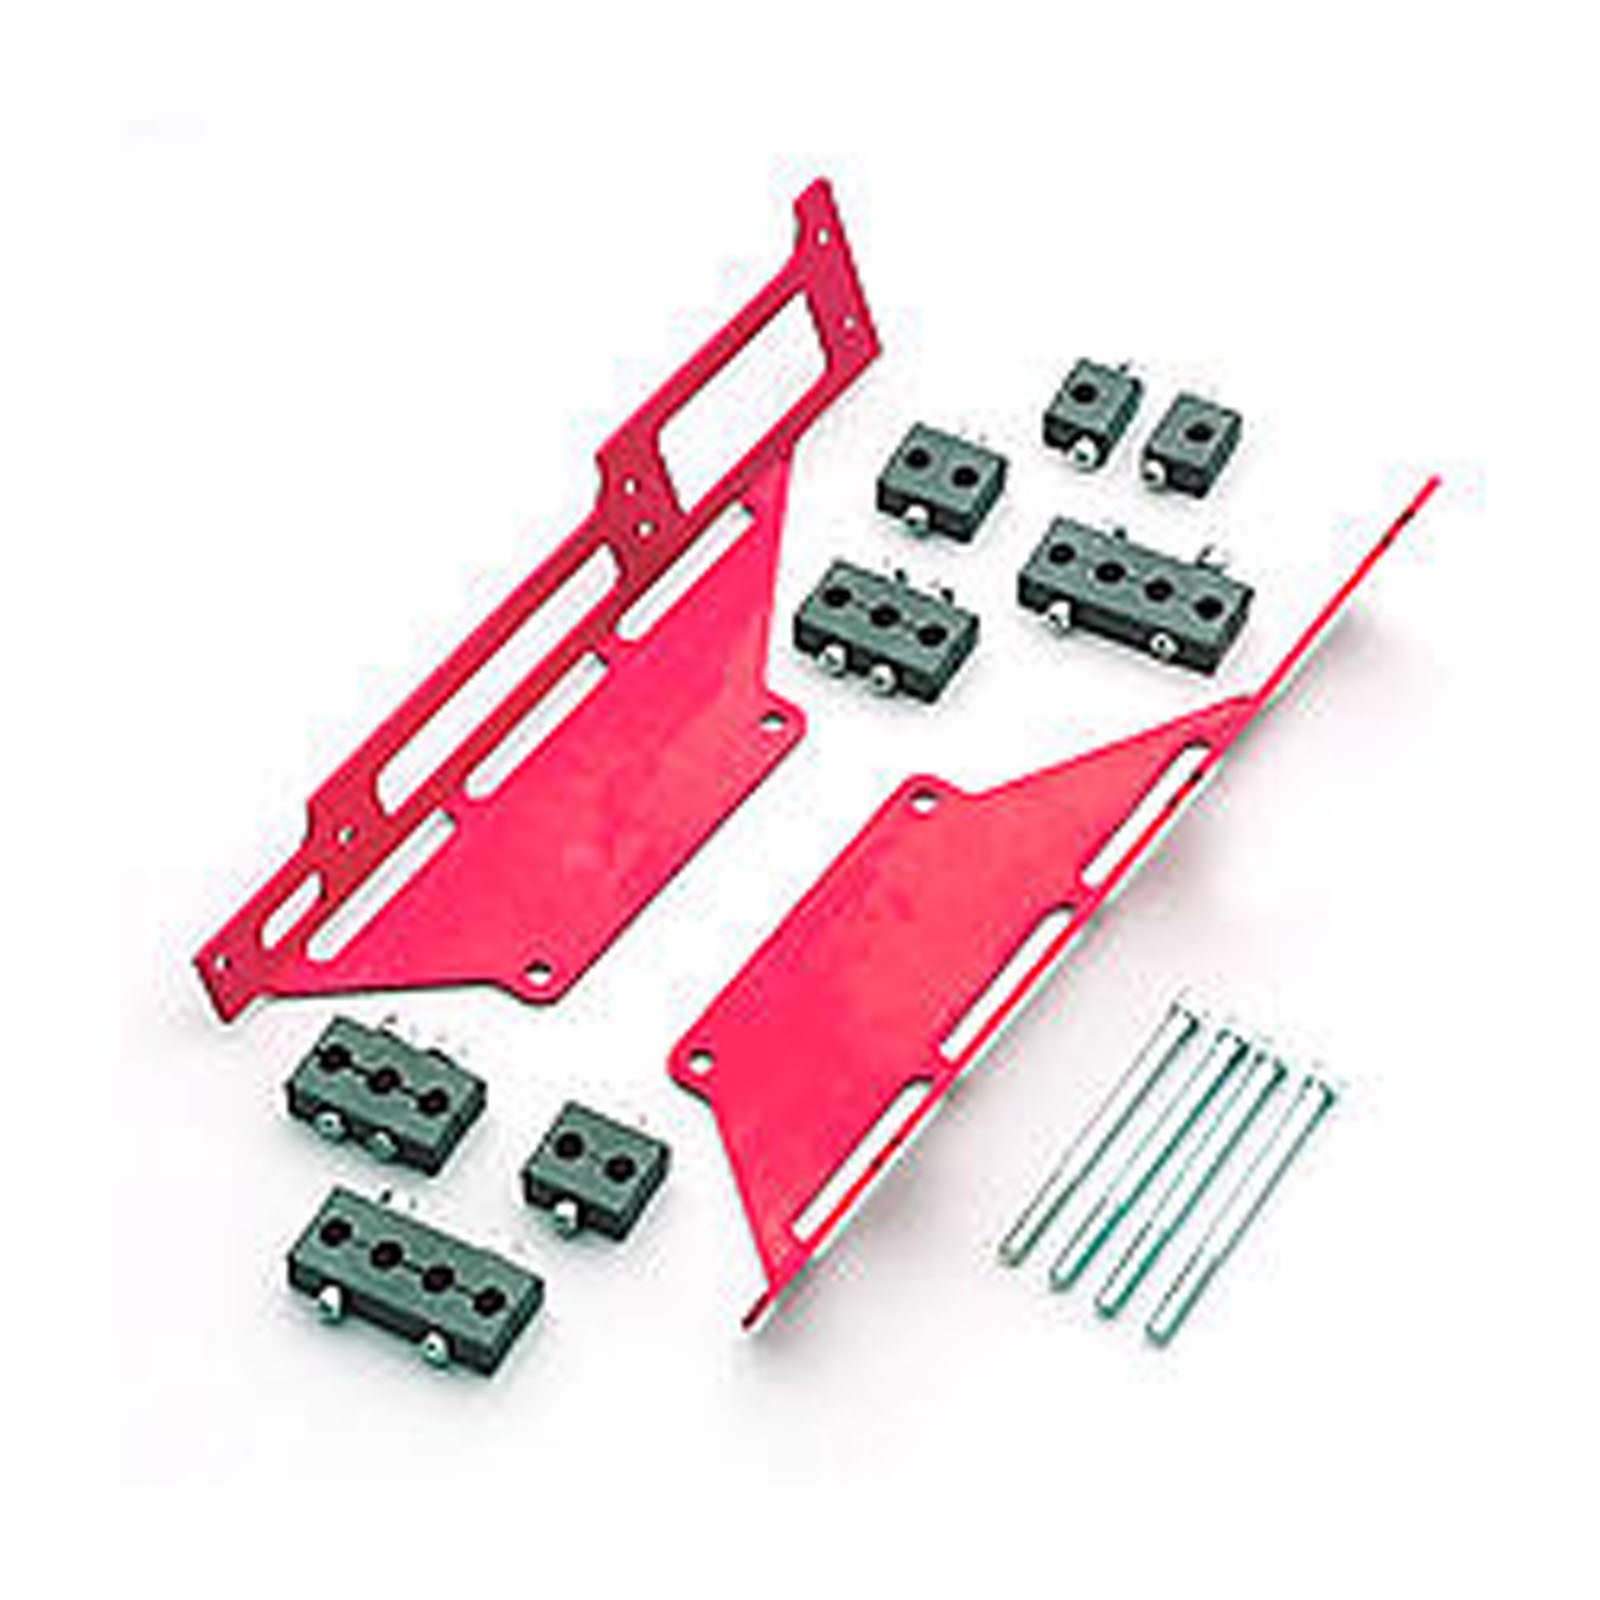 RM SPECIALTIES 1120R Spark Plug Wire Loom SBC C/B Red | eBay